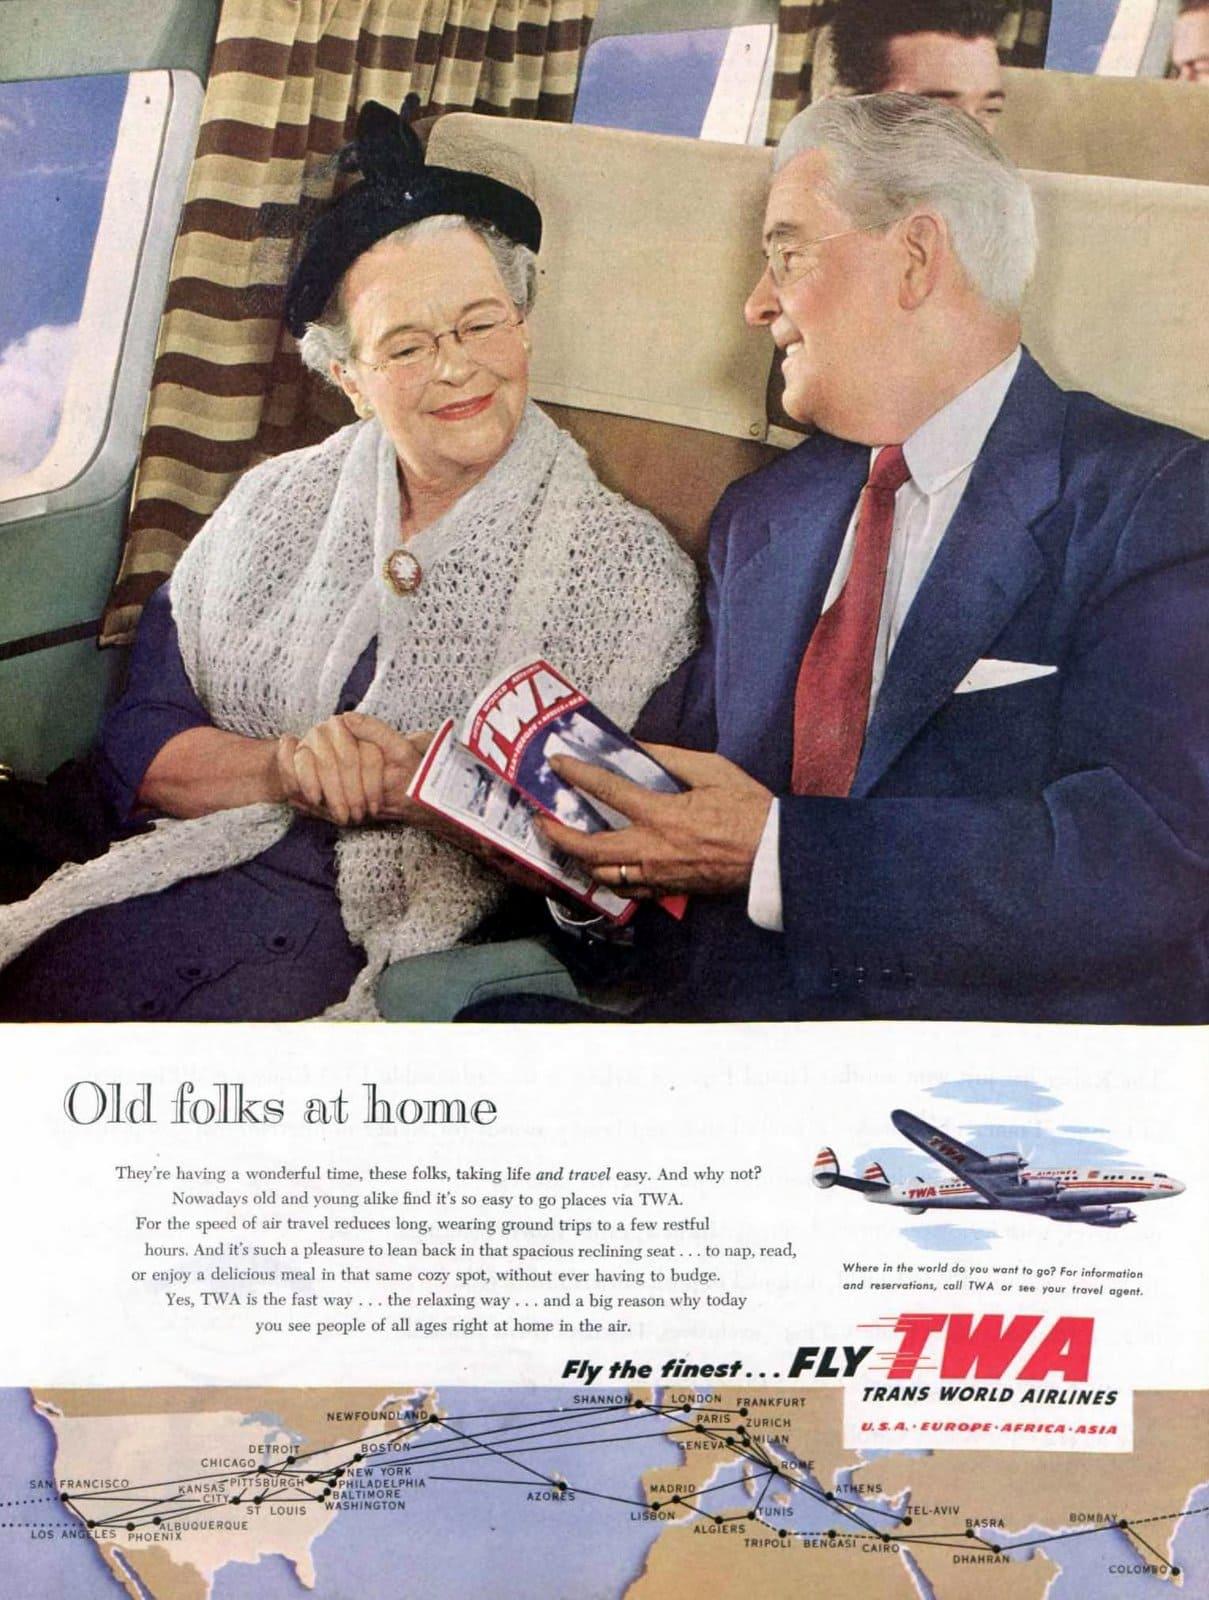 TWA airlines in flight (1953)